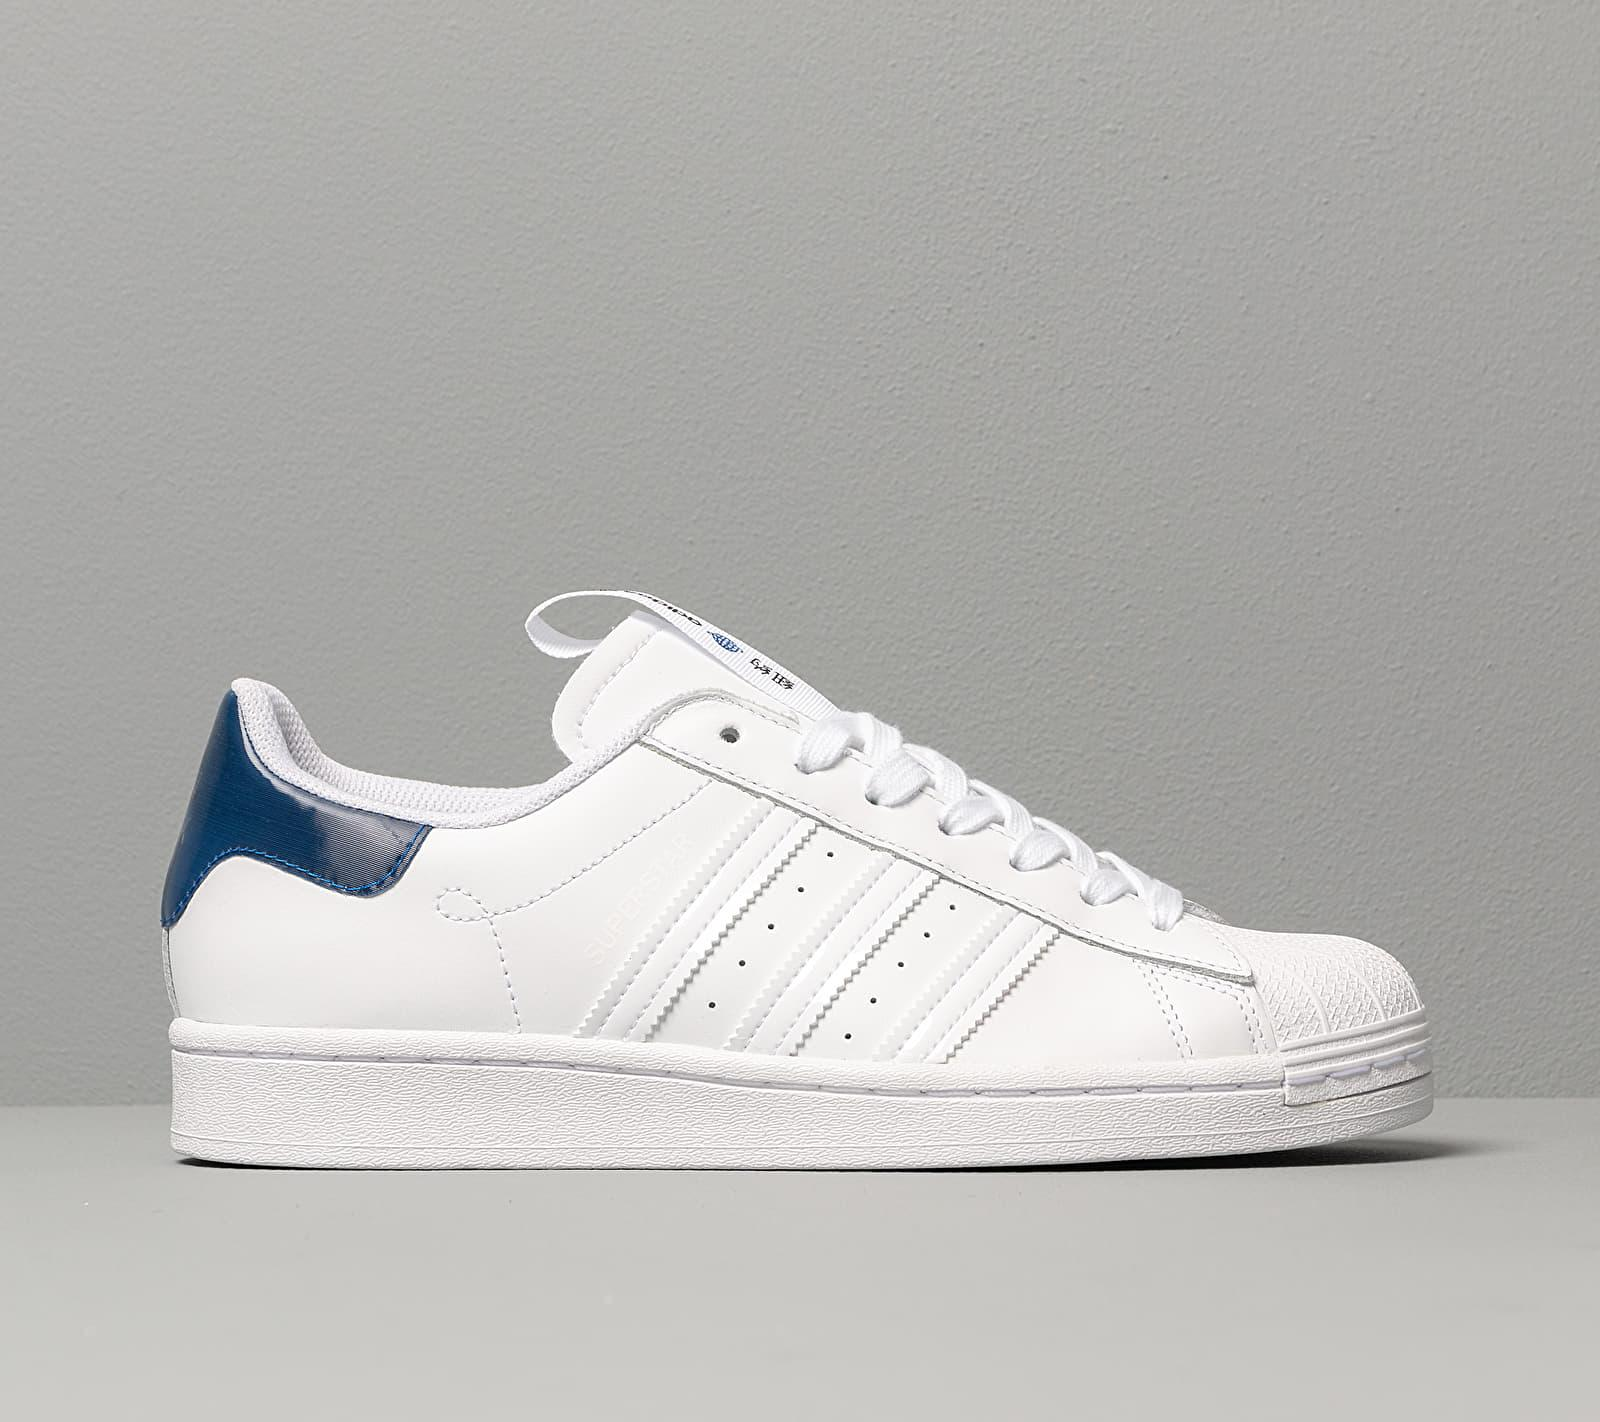 Adidas Superstar Ftwr White/ Collegiate Royal/ Core Black